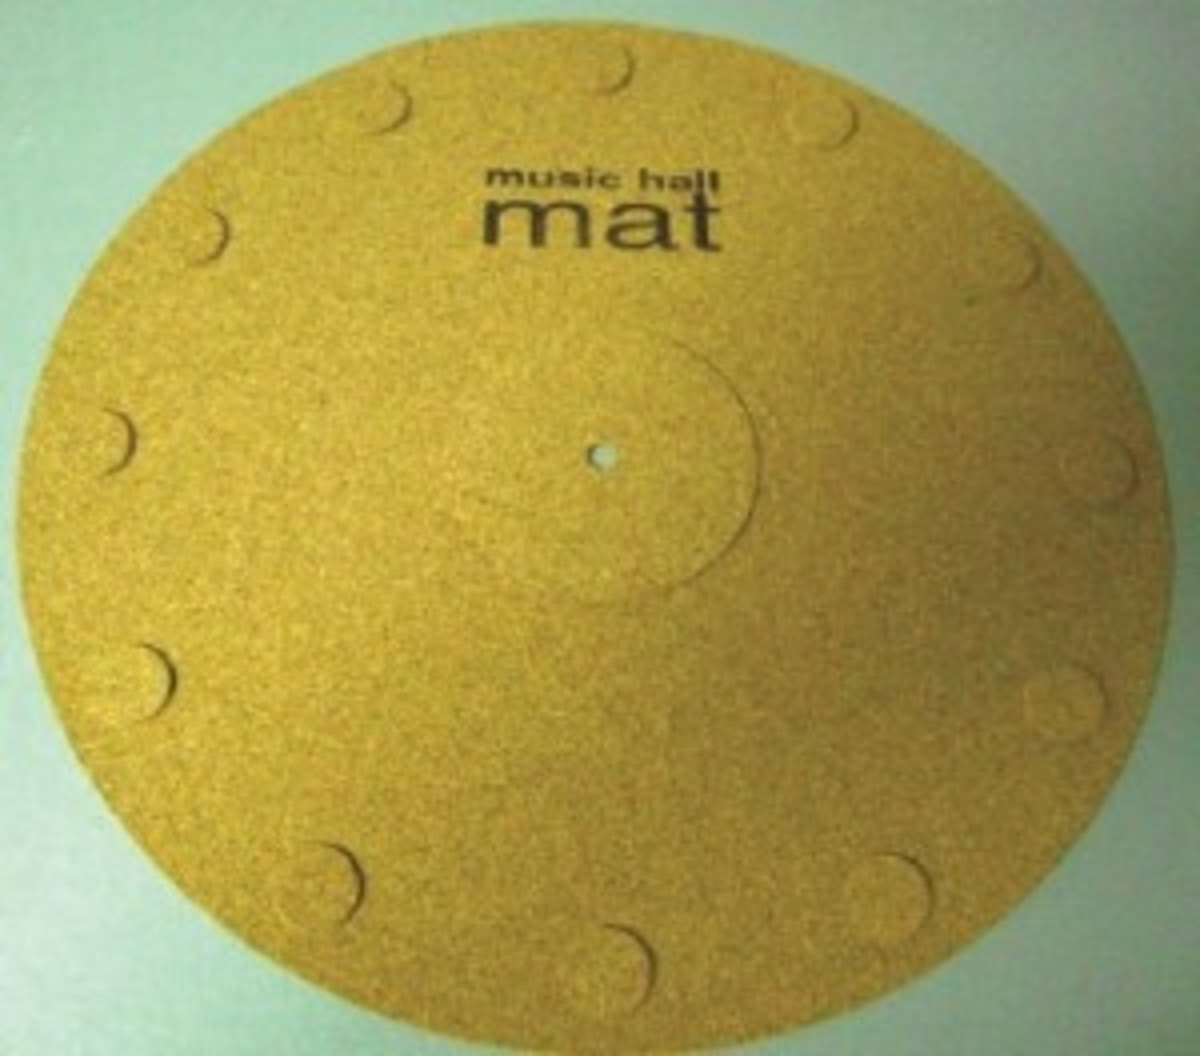 music hall mat vinyl record player